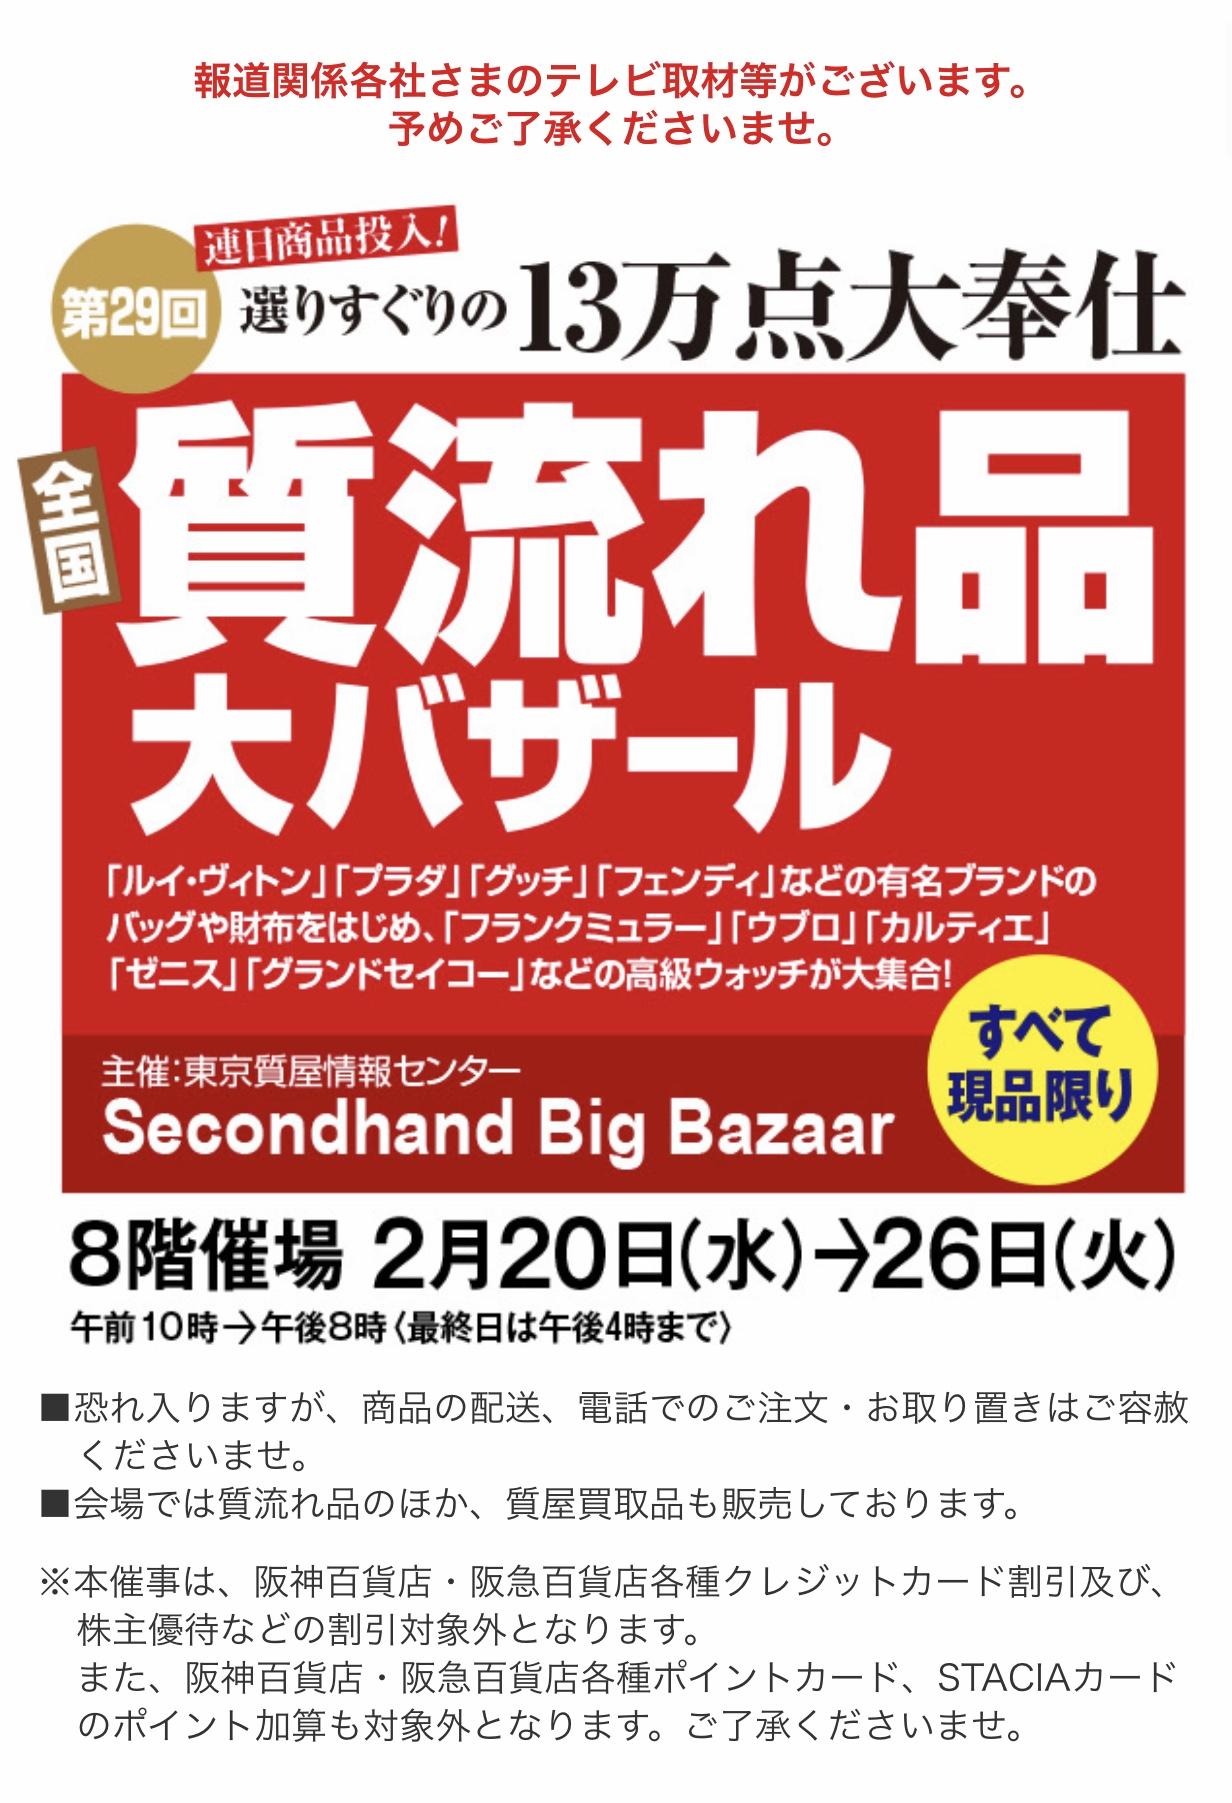 http://miichi-shichiho.com/common/editor/files/8E7EC889-BF60-4B1F-A2FC-5F8370D33C3C.jpeg